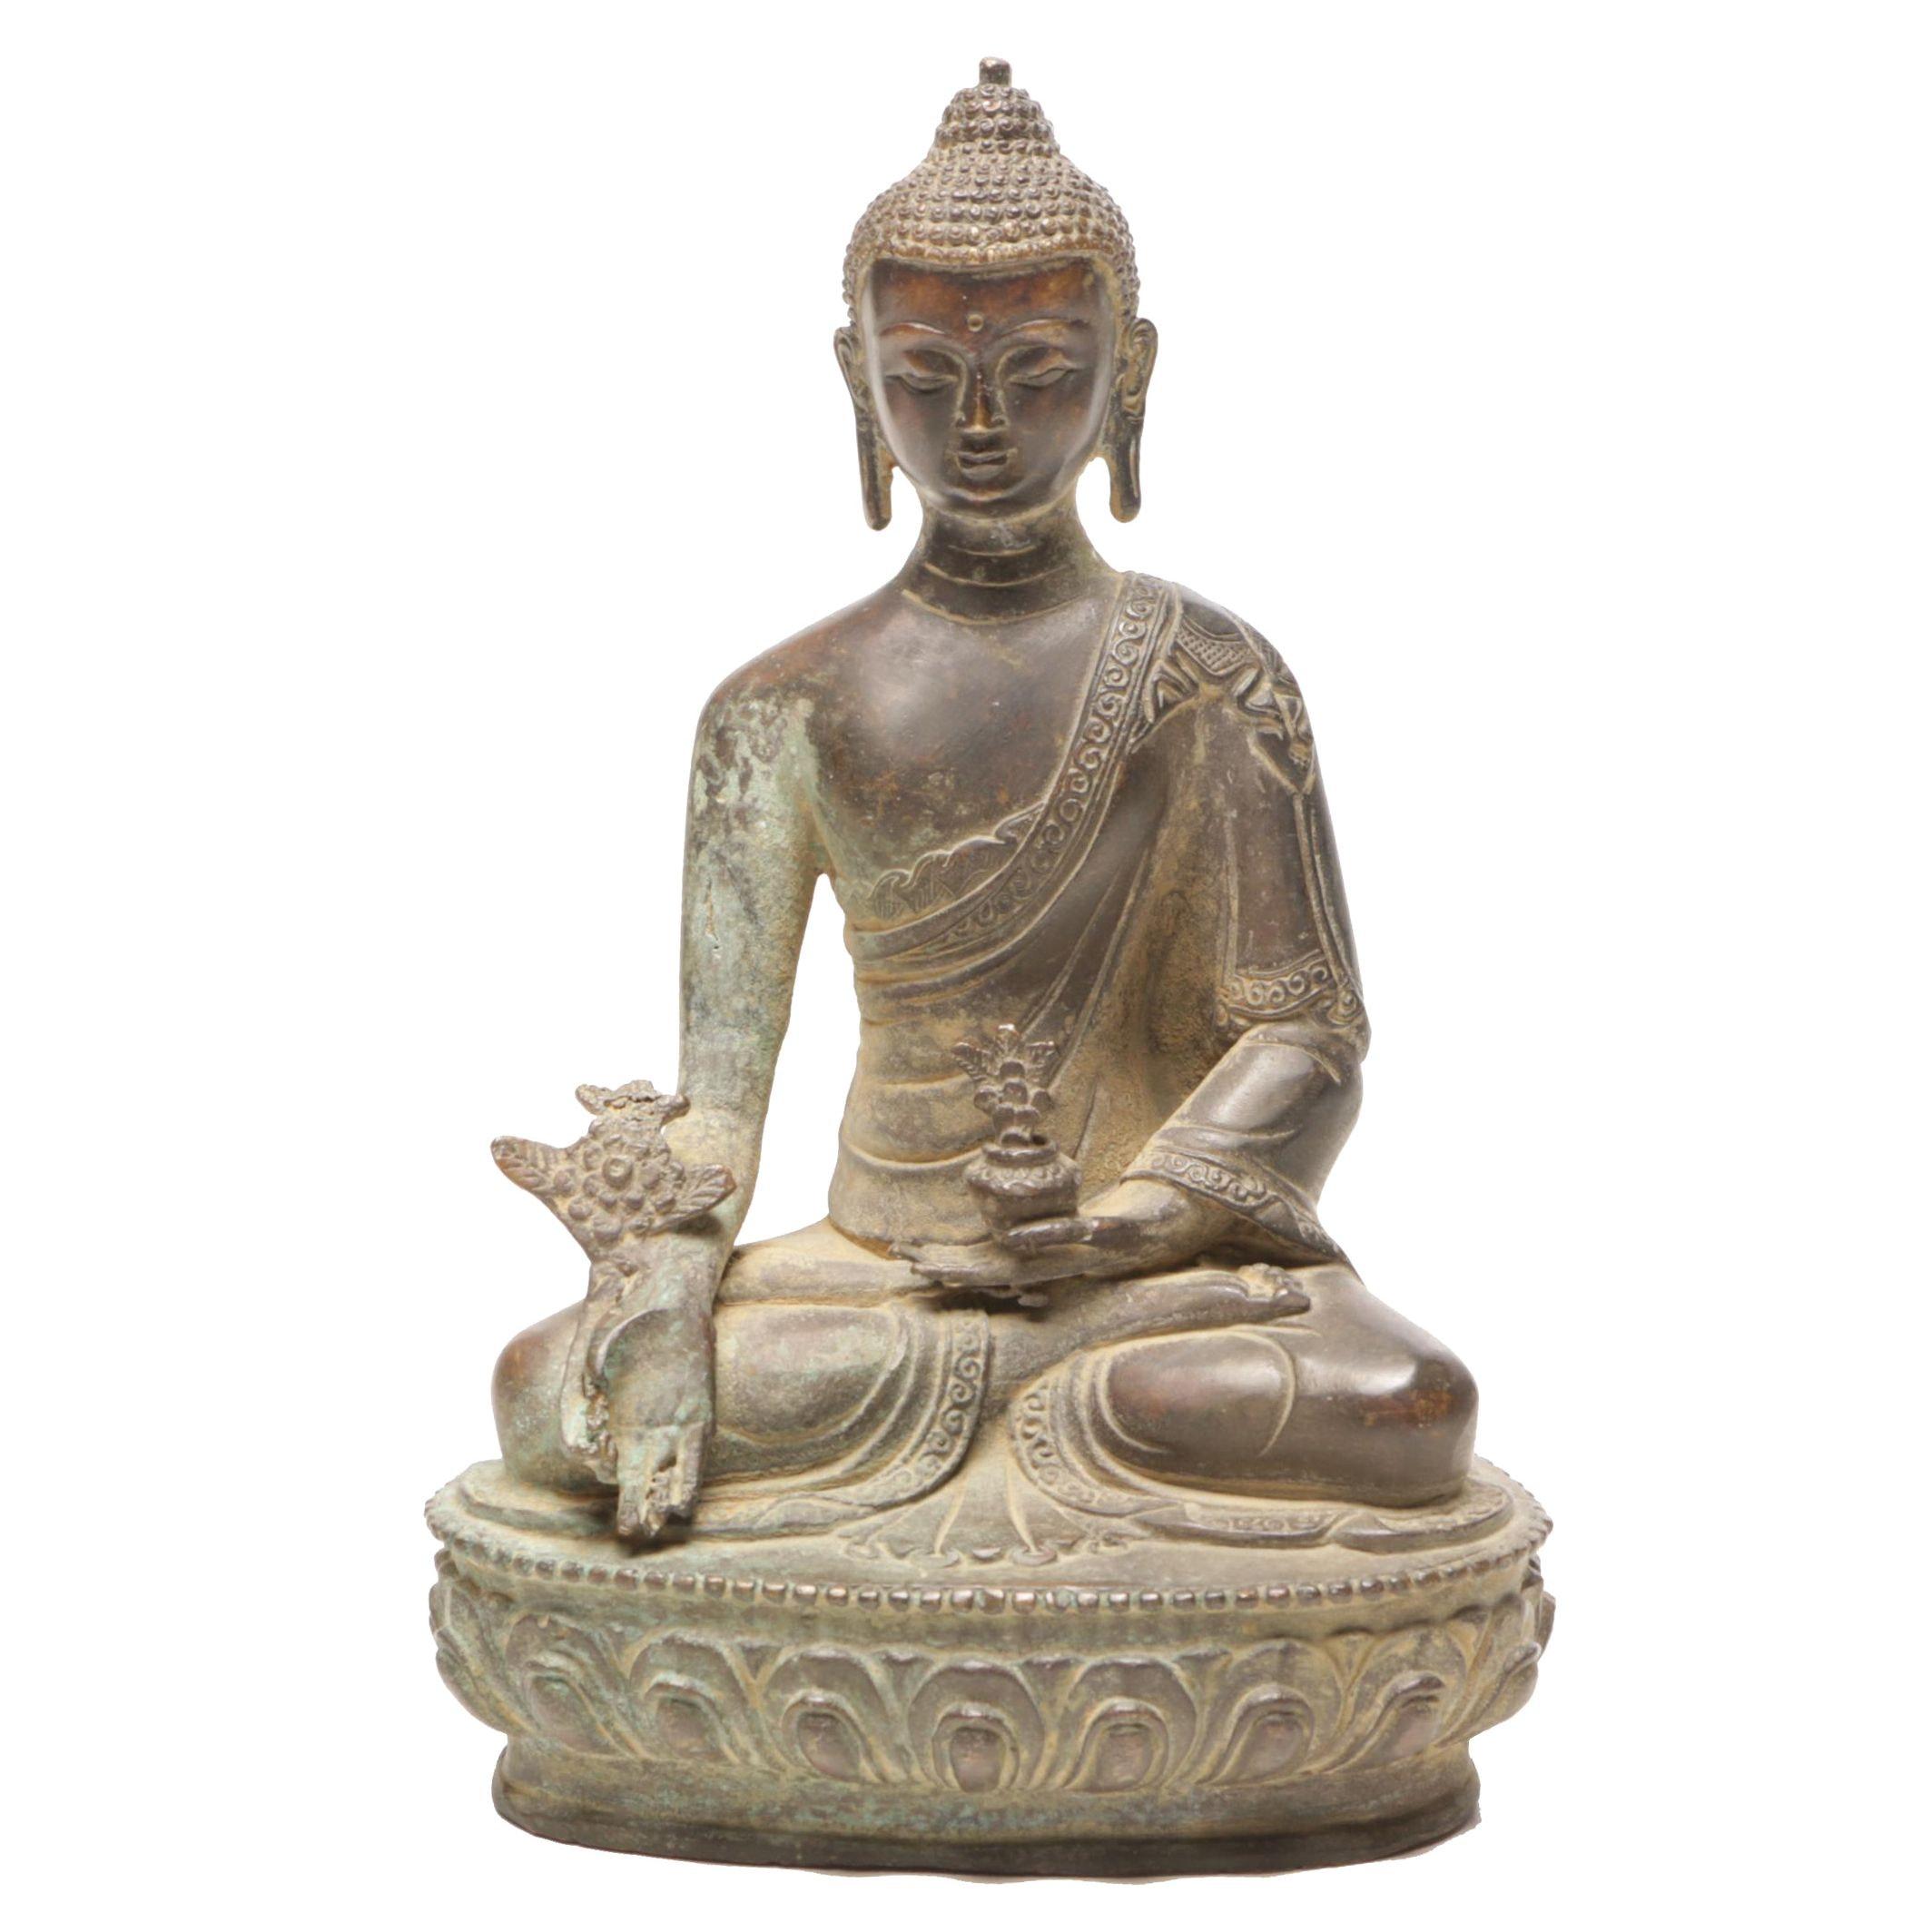 Sino-Tibetan Cast Brass Buddha Figurine